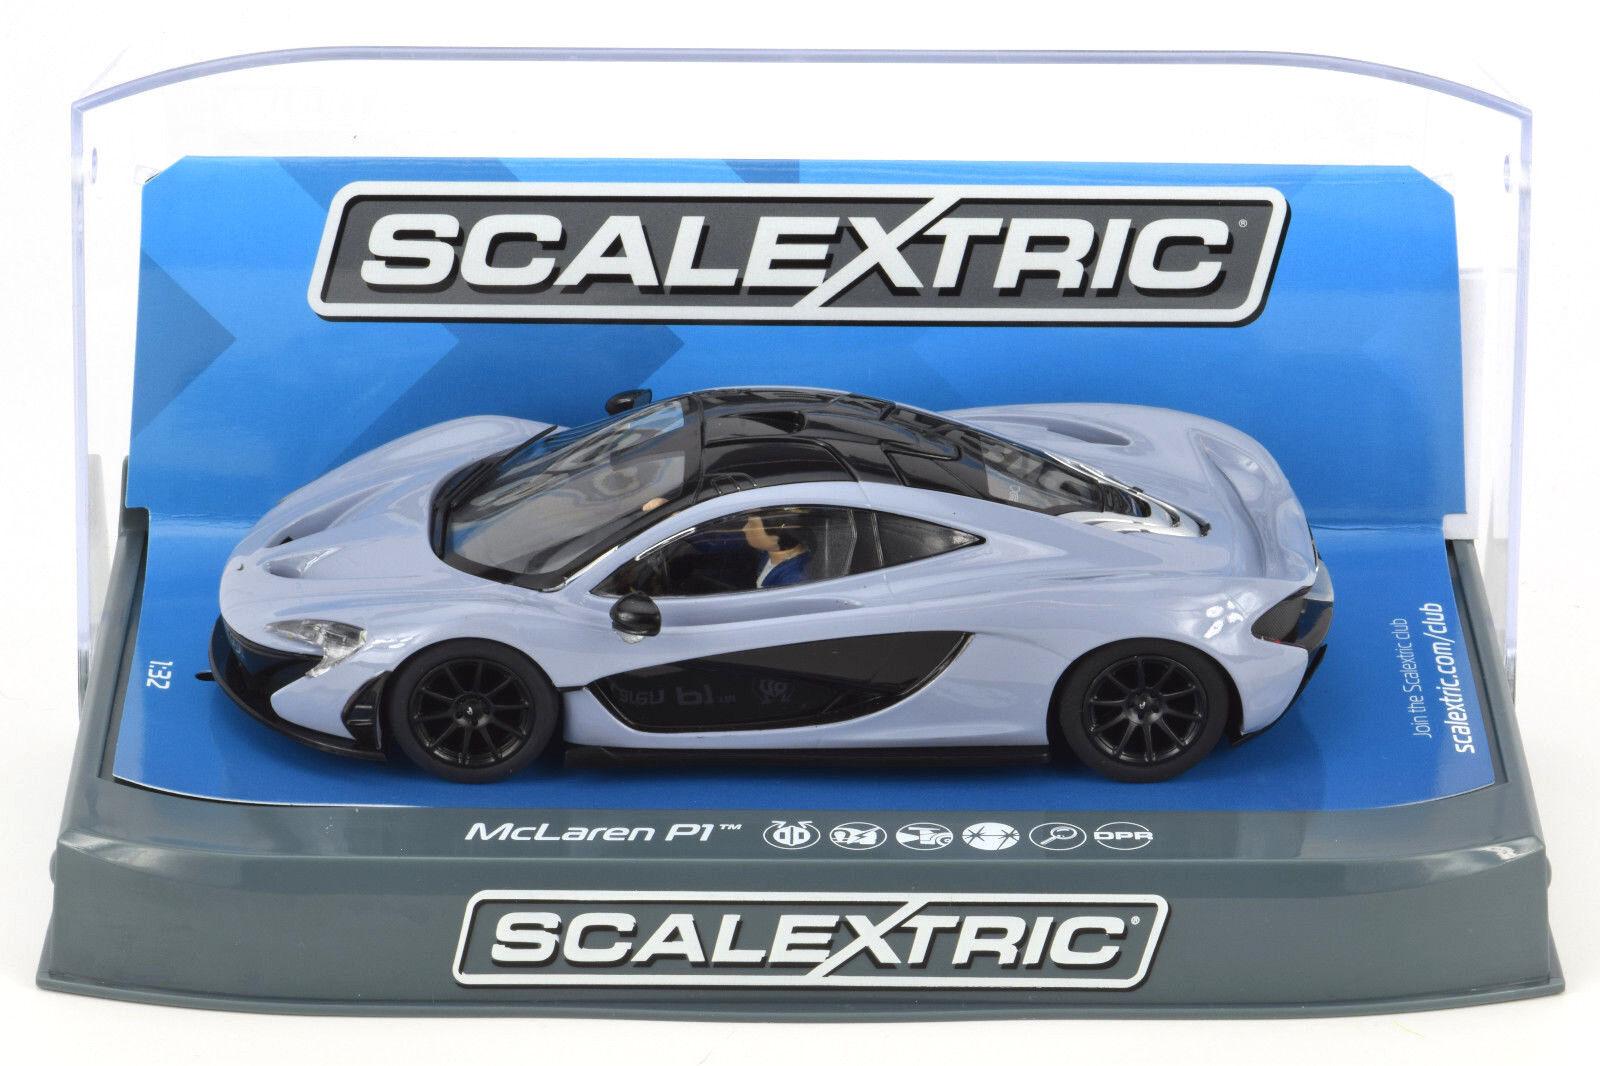 Scalextric Ceramic Grey McLaren P1 DPR W  Lights 1 32 Scale Slot Car C3877